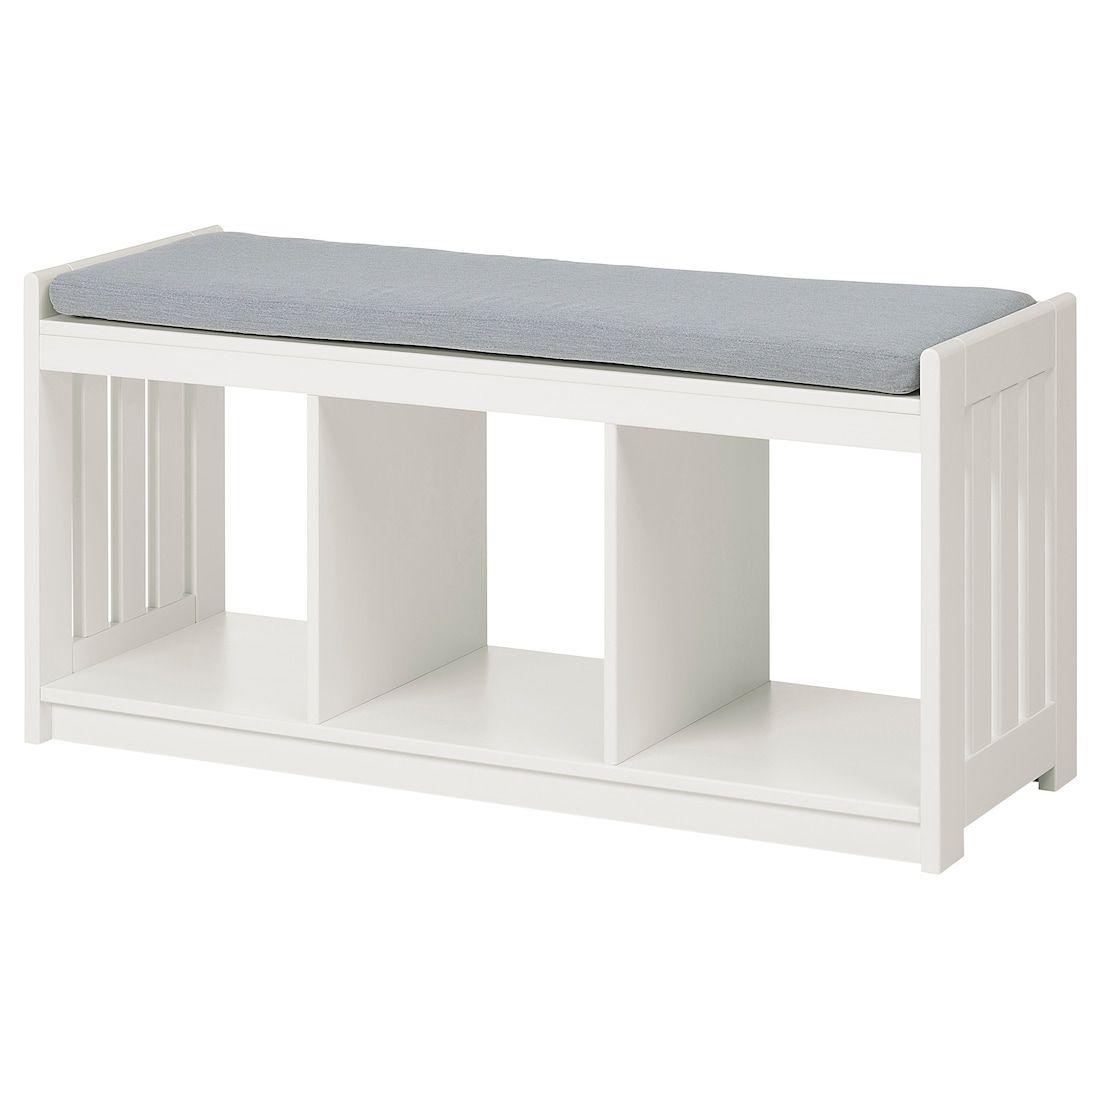 Panget Storage Bench White Ikea Storage Bench Bench With Storage Shoe Cabinet White storage bench with cushion